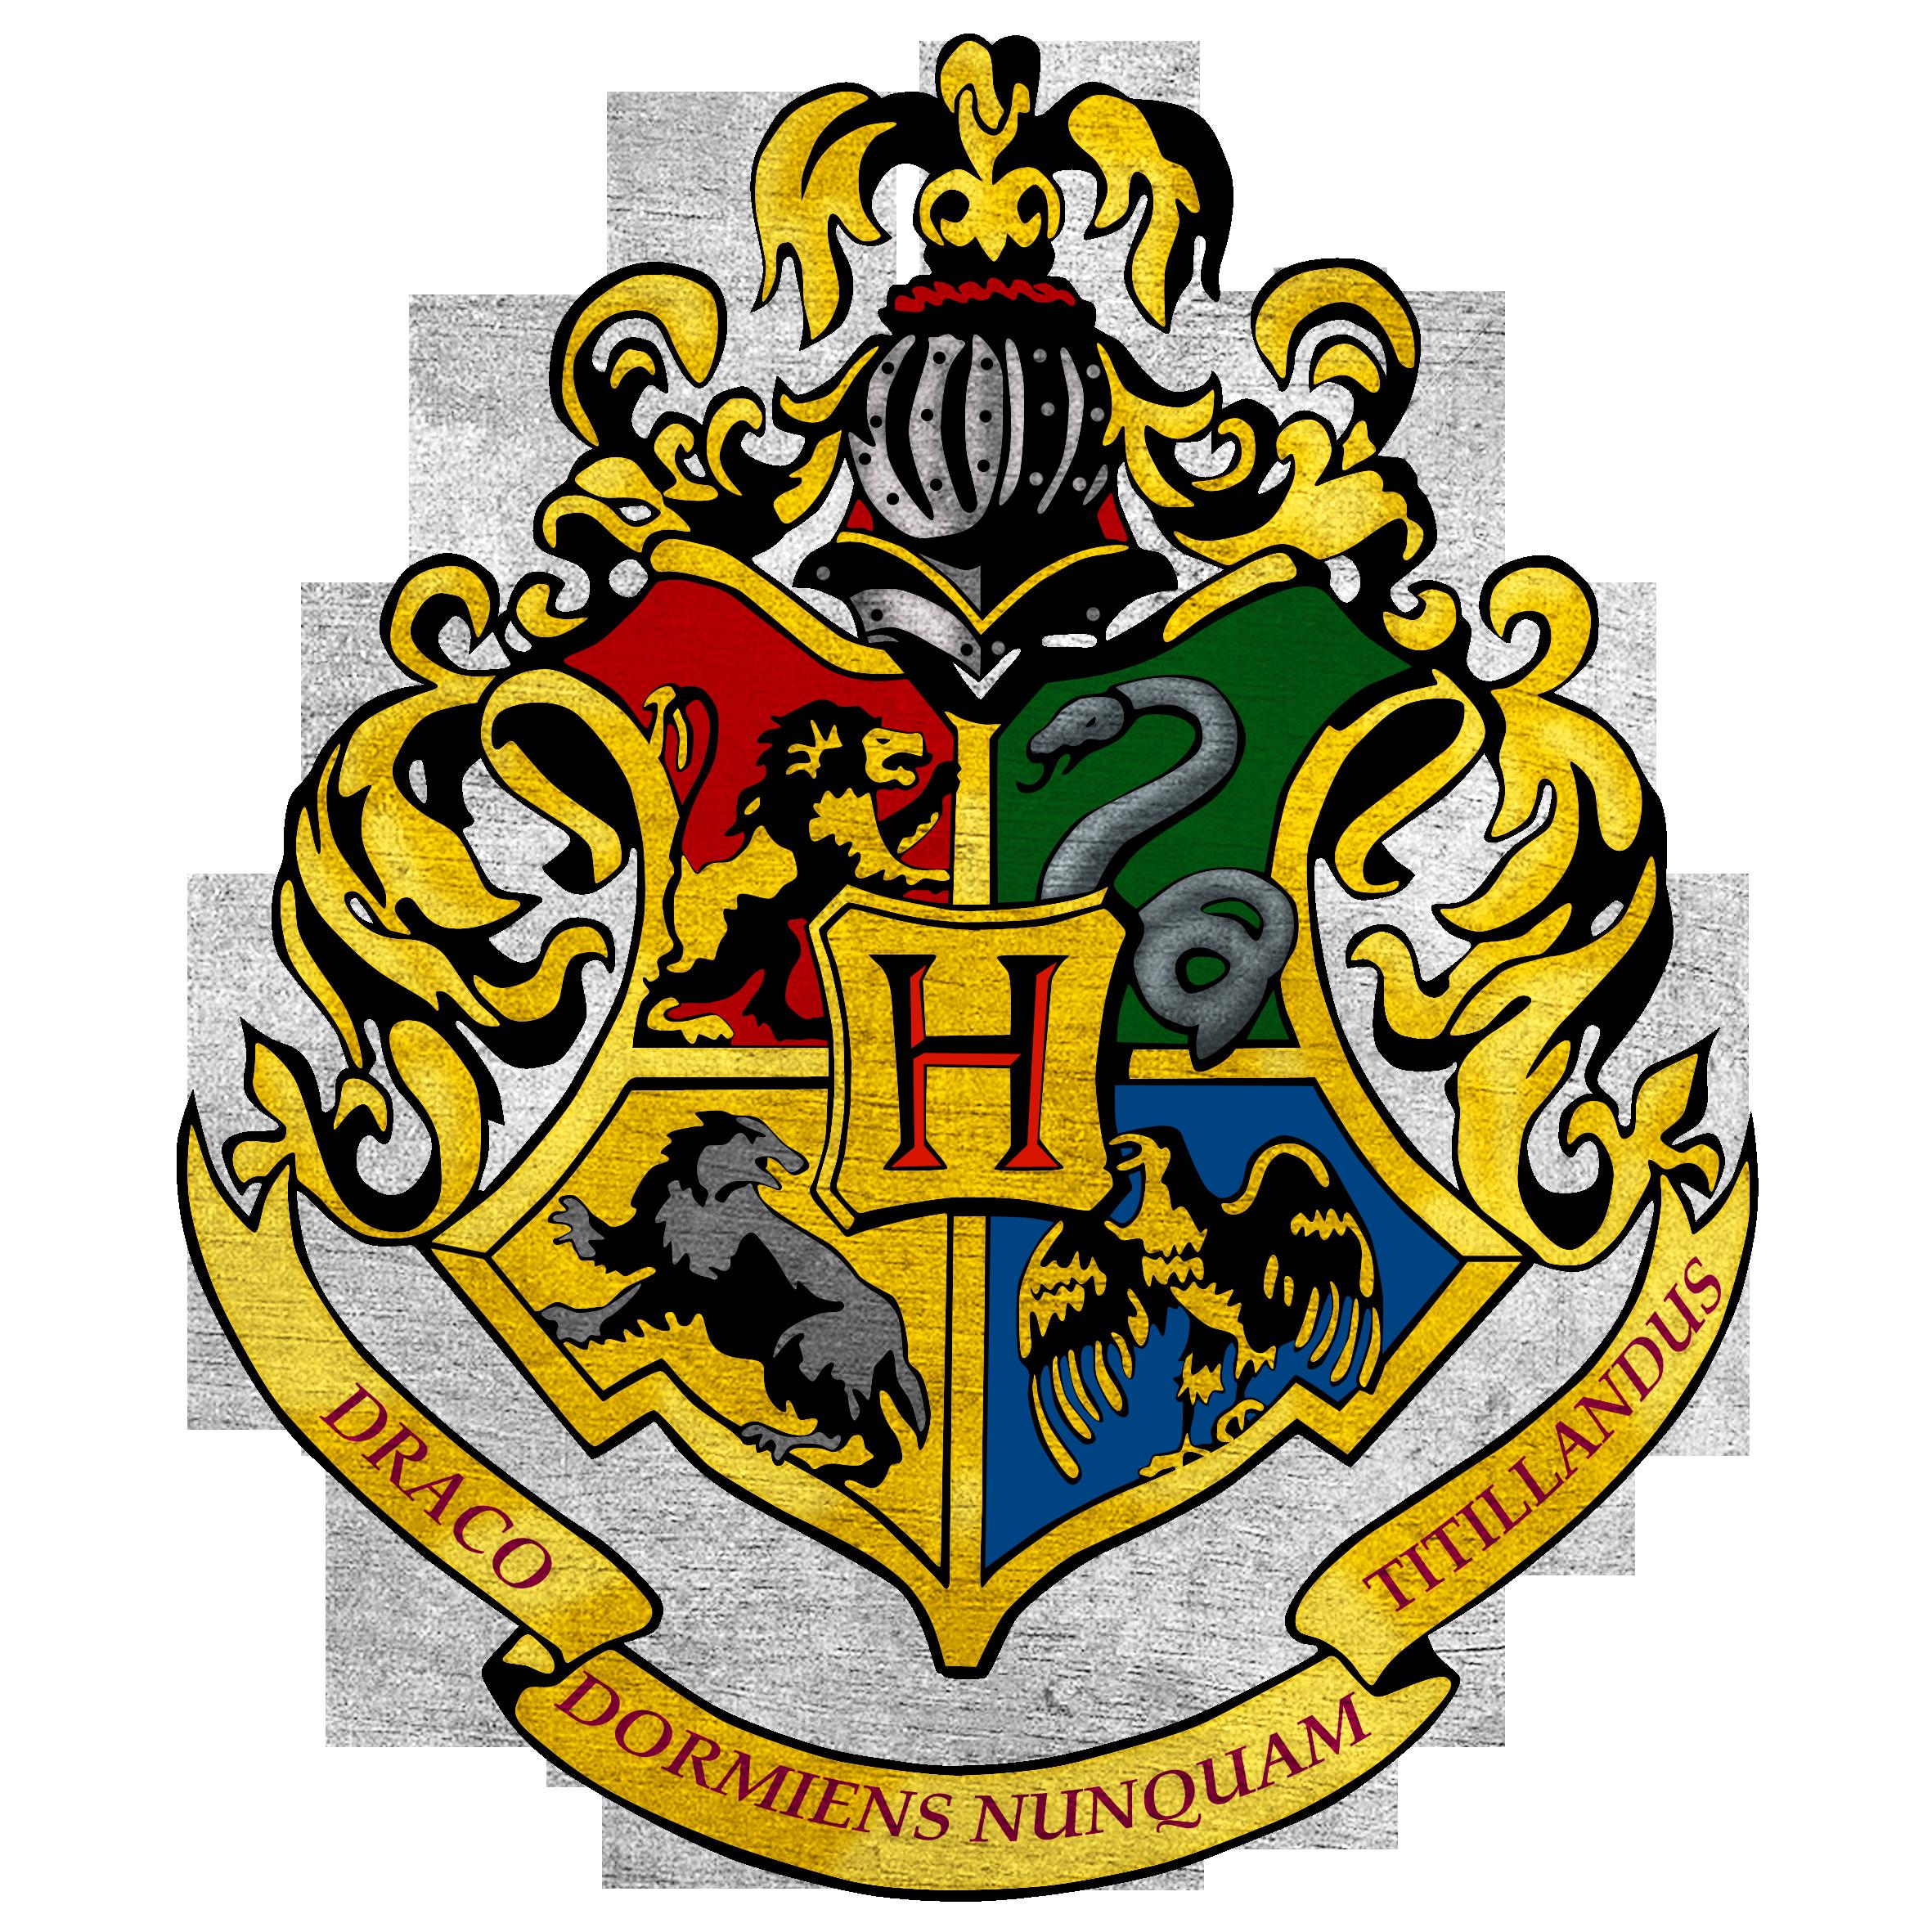 Hogwarts logo by shadoPro 2362x2362